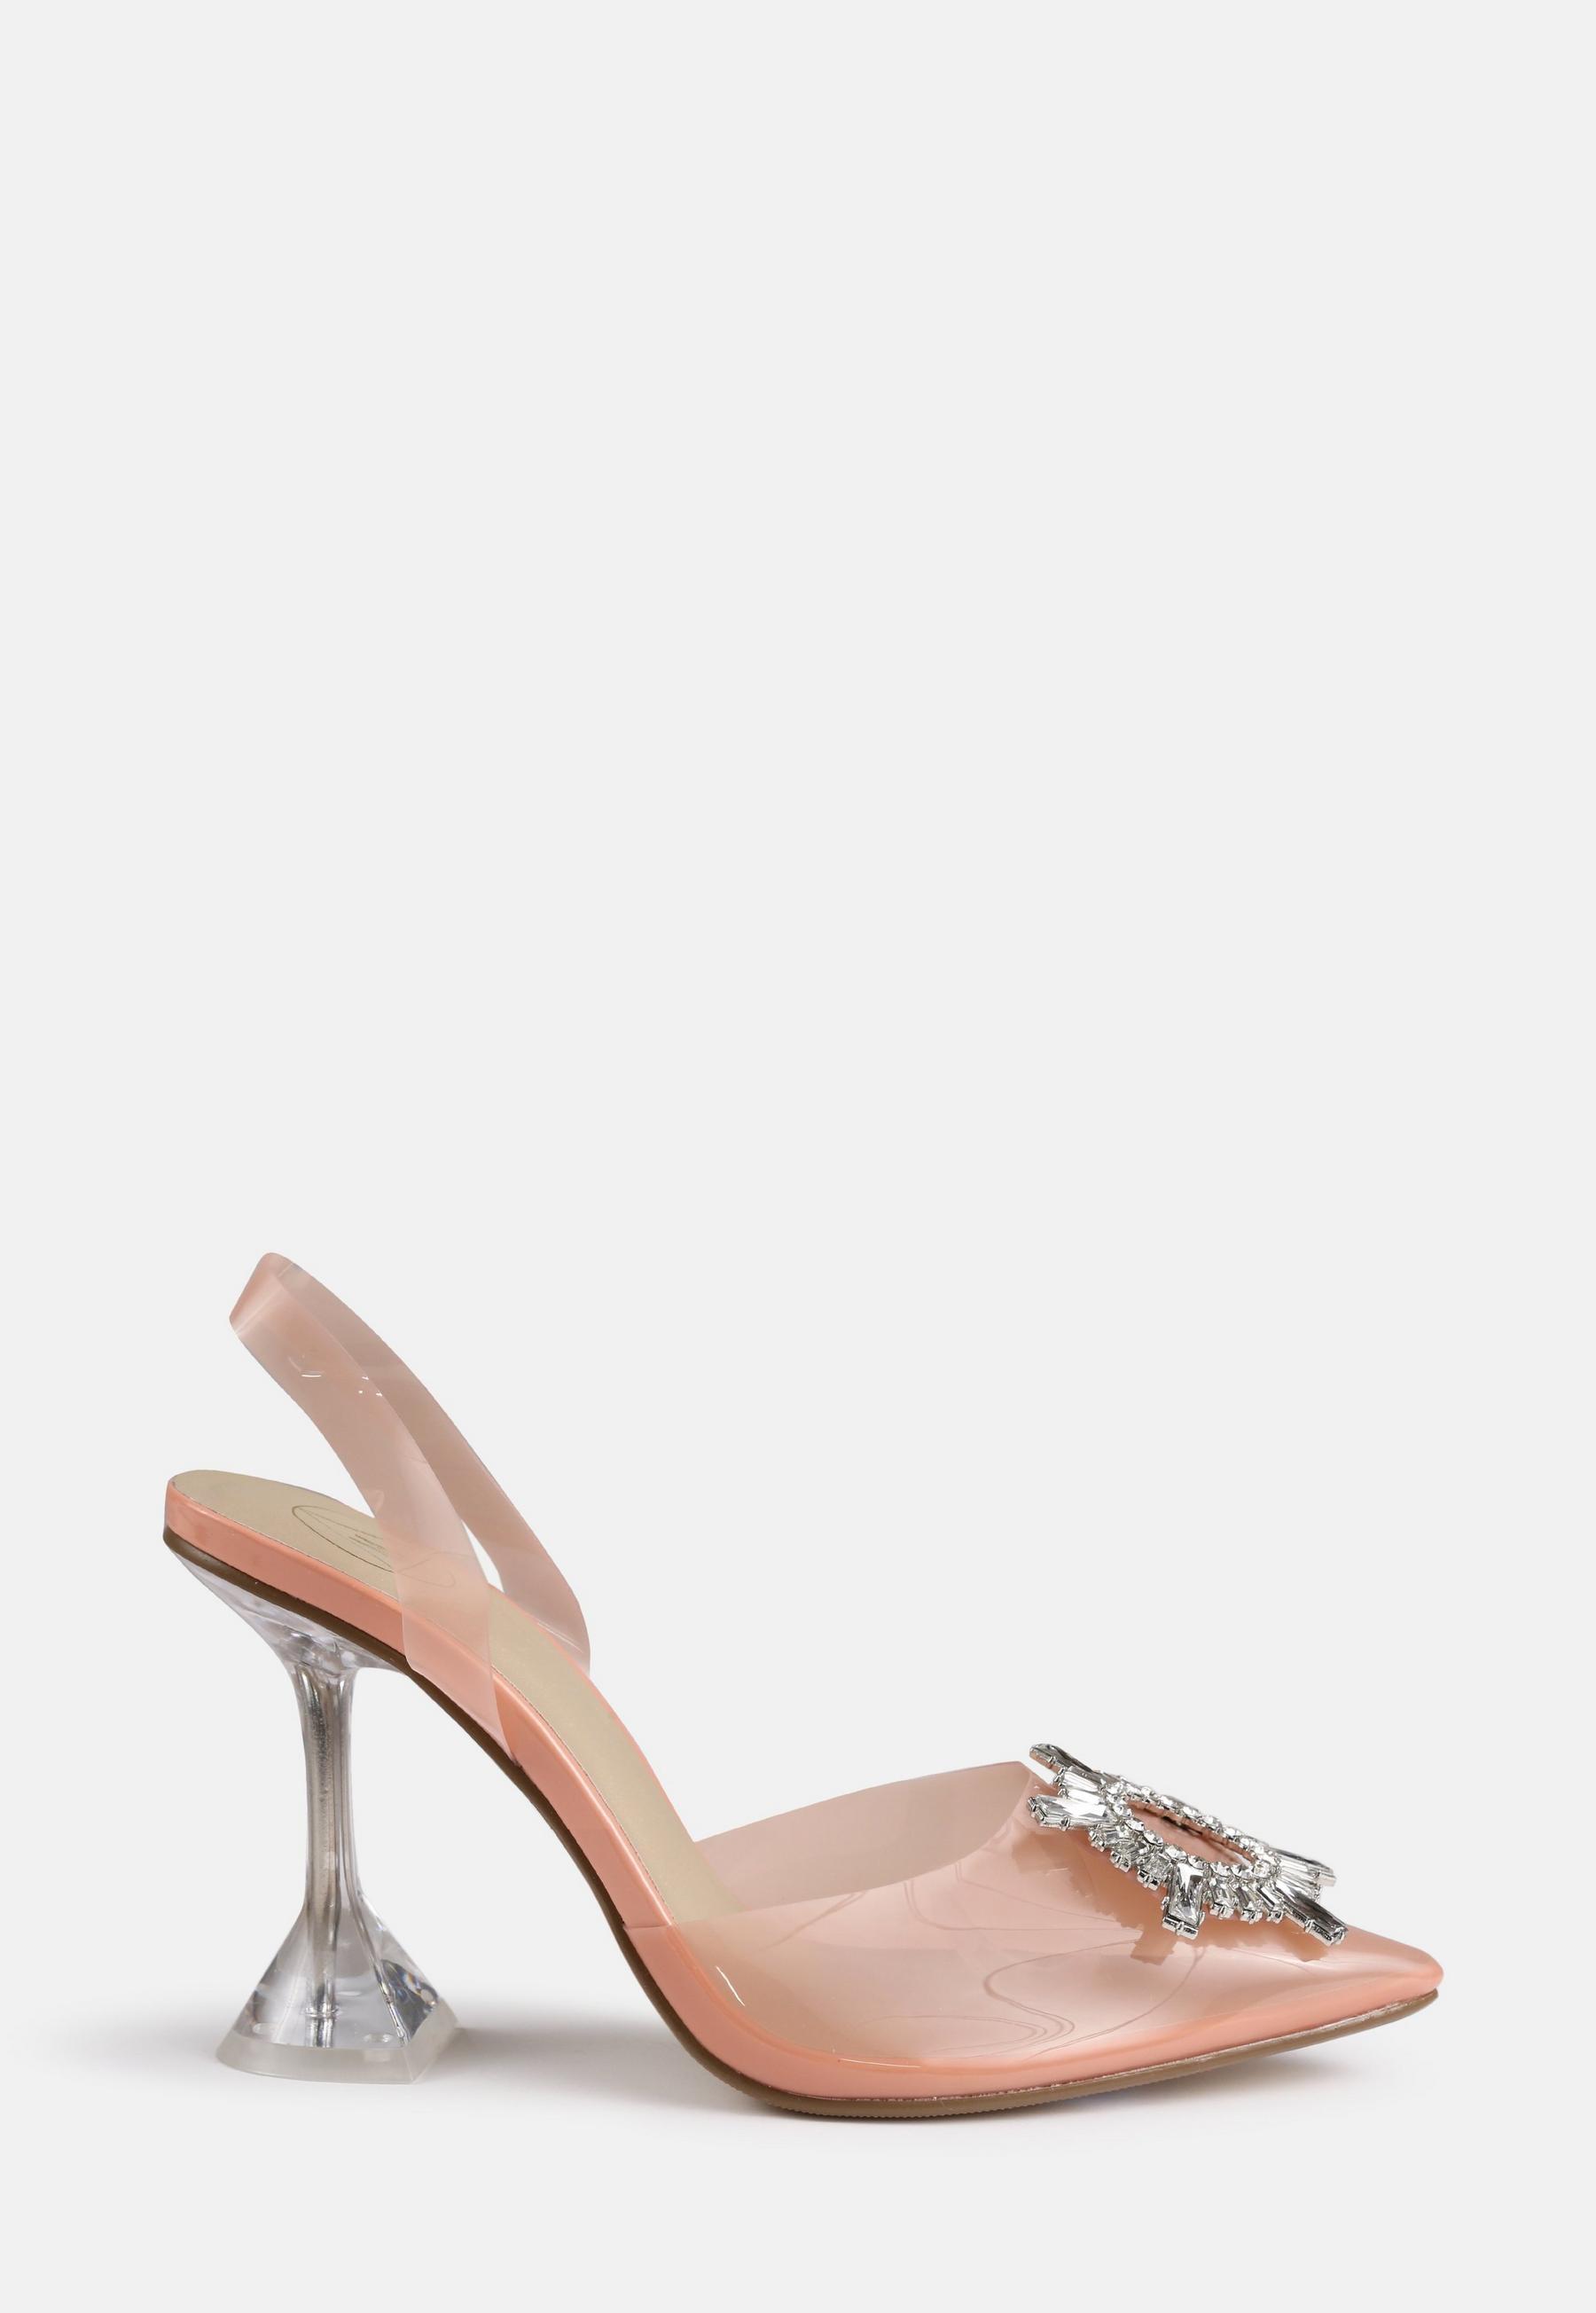 Nude Clear Strap Block Flat Diamante High Heels